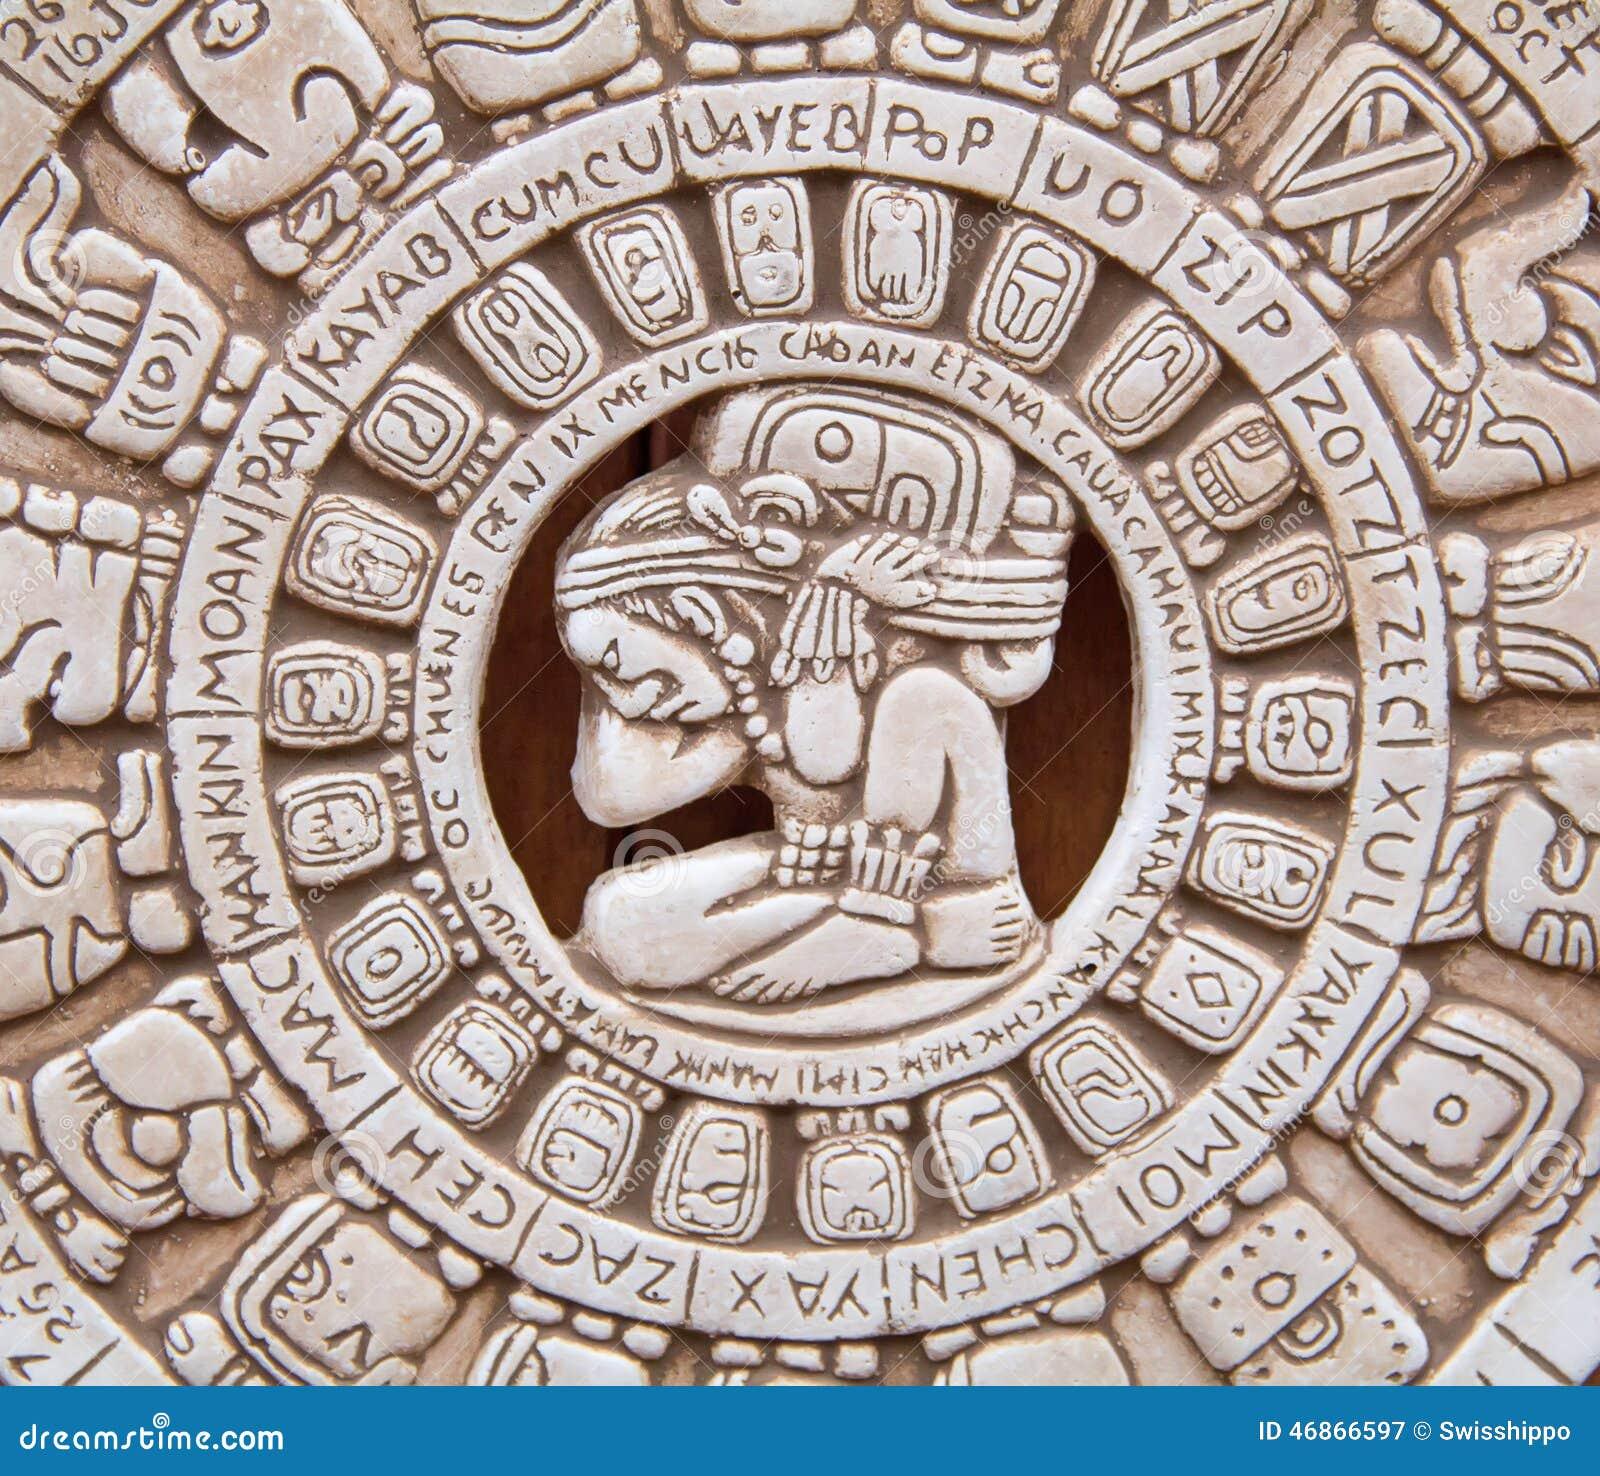 Stock Photo Maya Sun Fragment Mayan Symbolic Carved Stone Image46866597